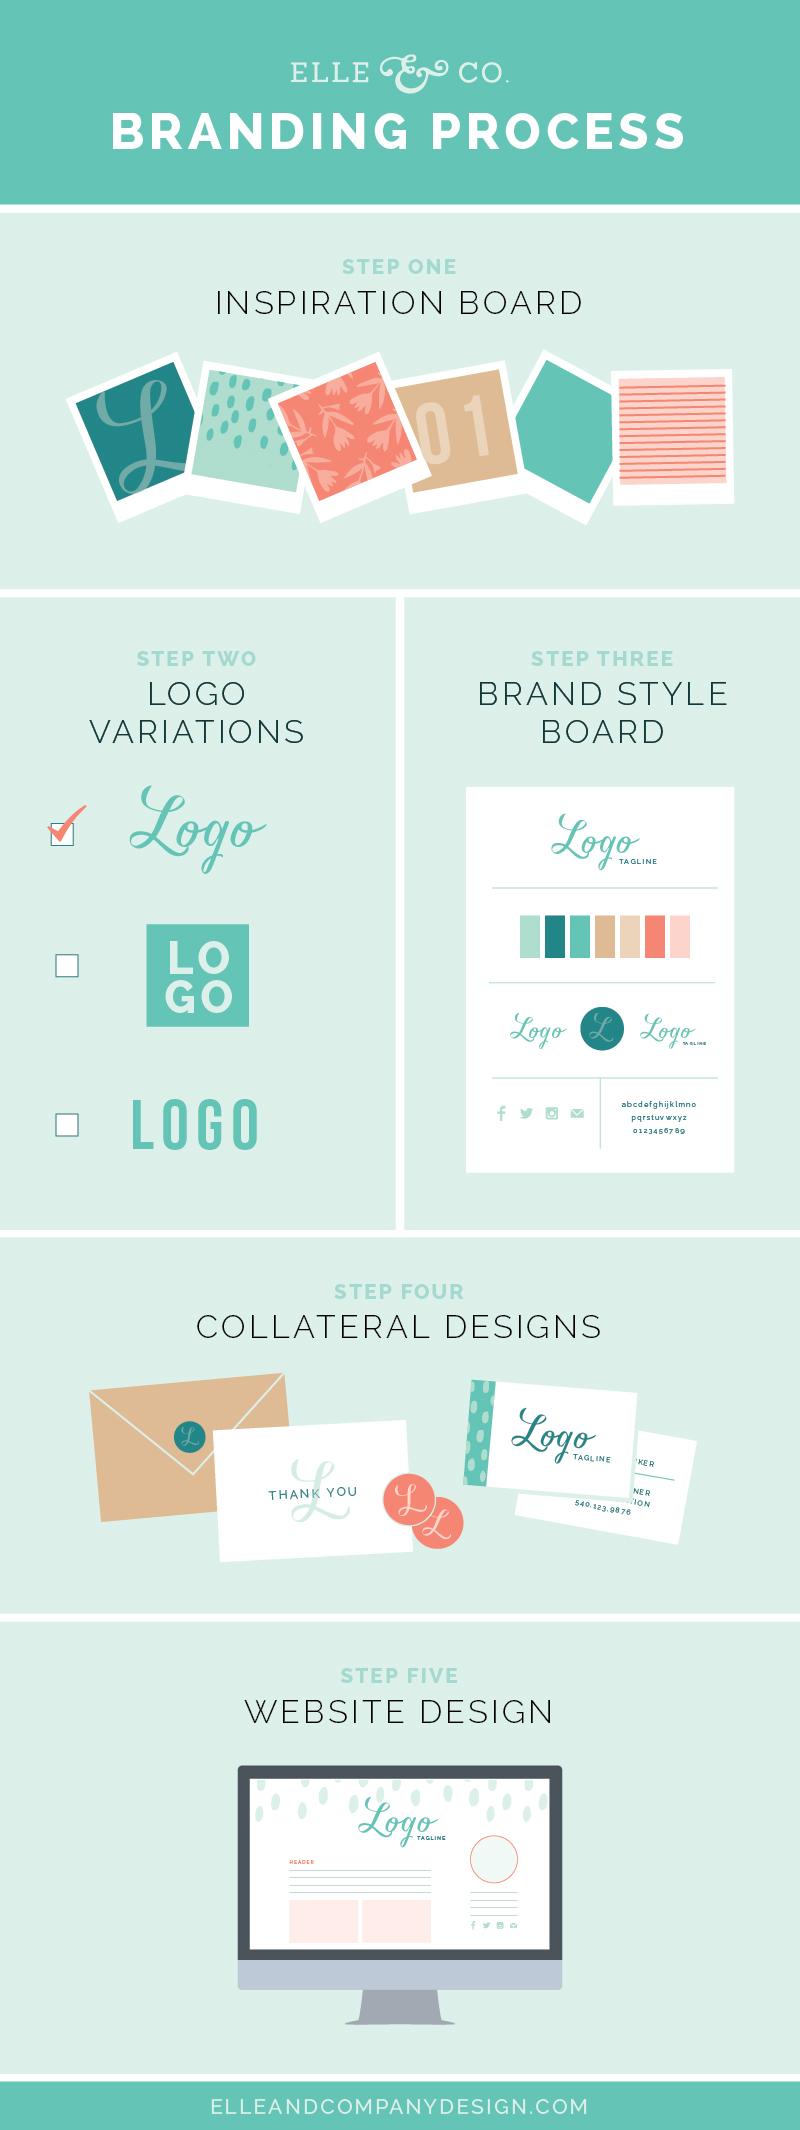 Elle & Company Branding Process